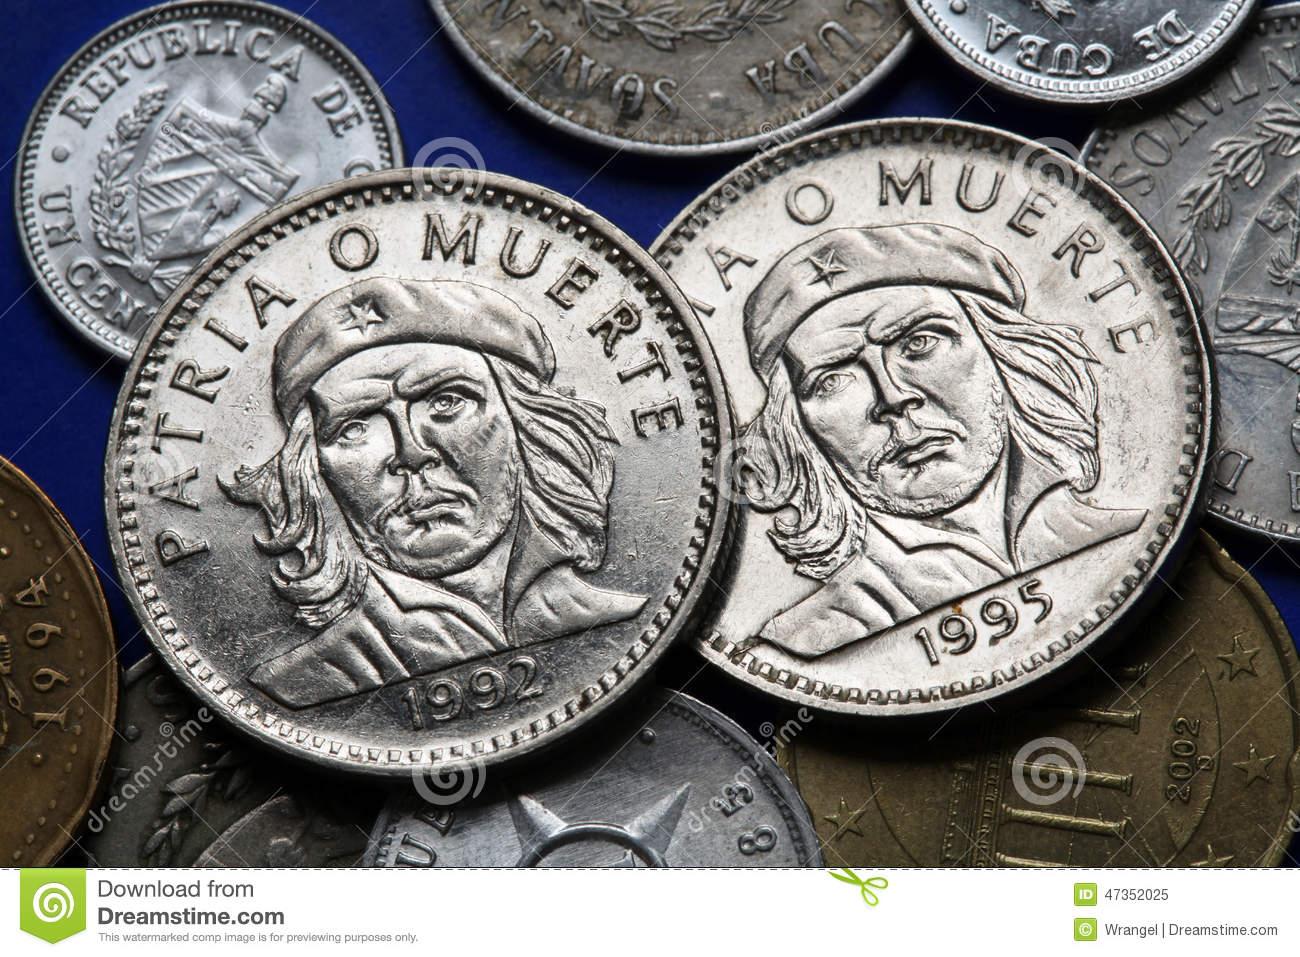 moedas-de-cuba-ernesto-che-guevara-47352025.jpg